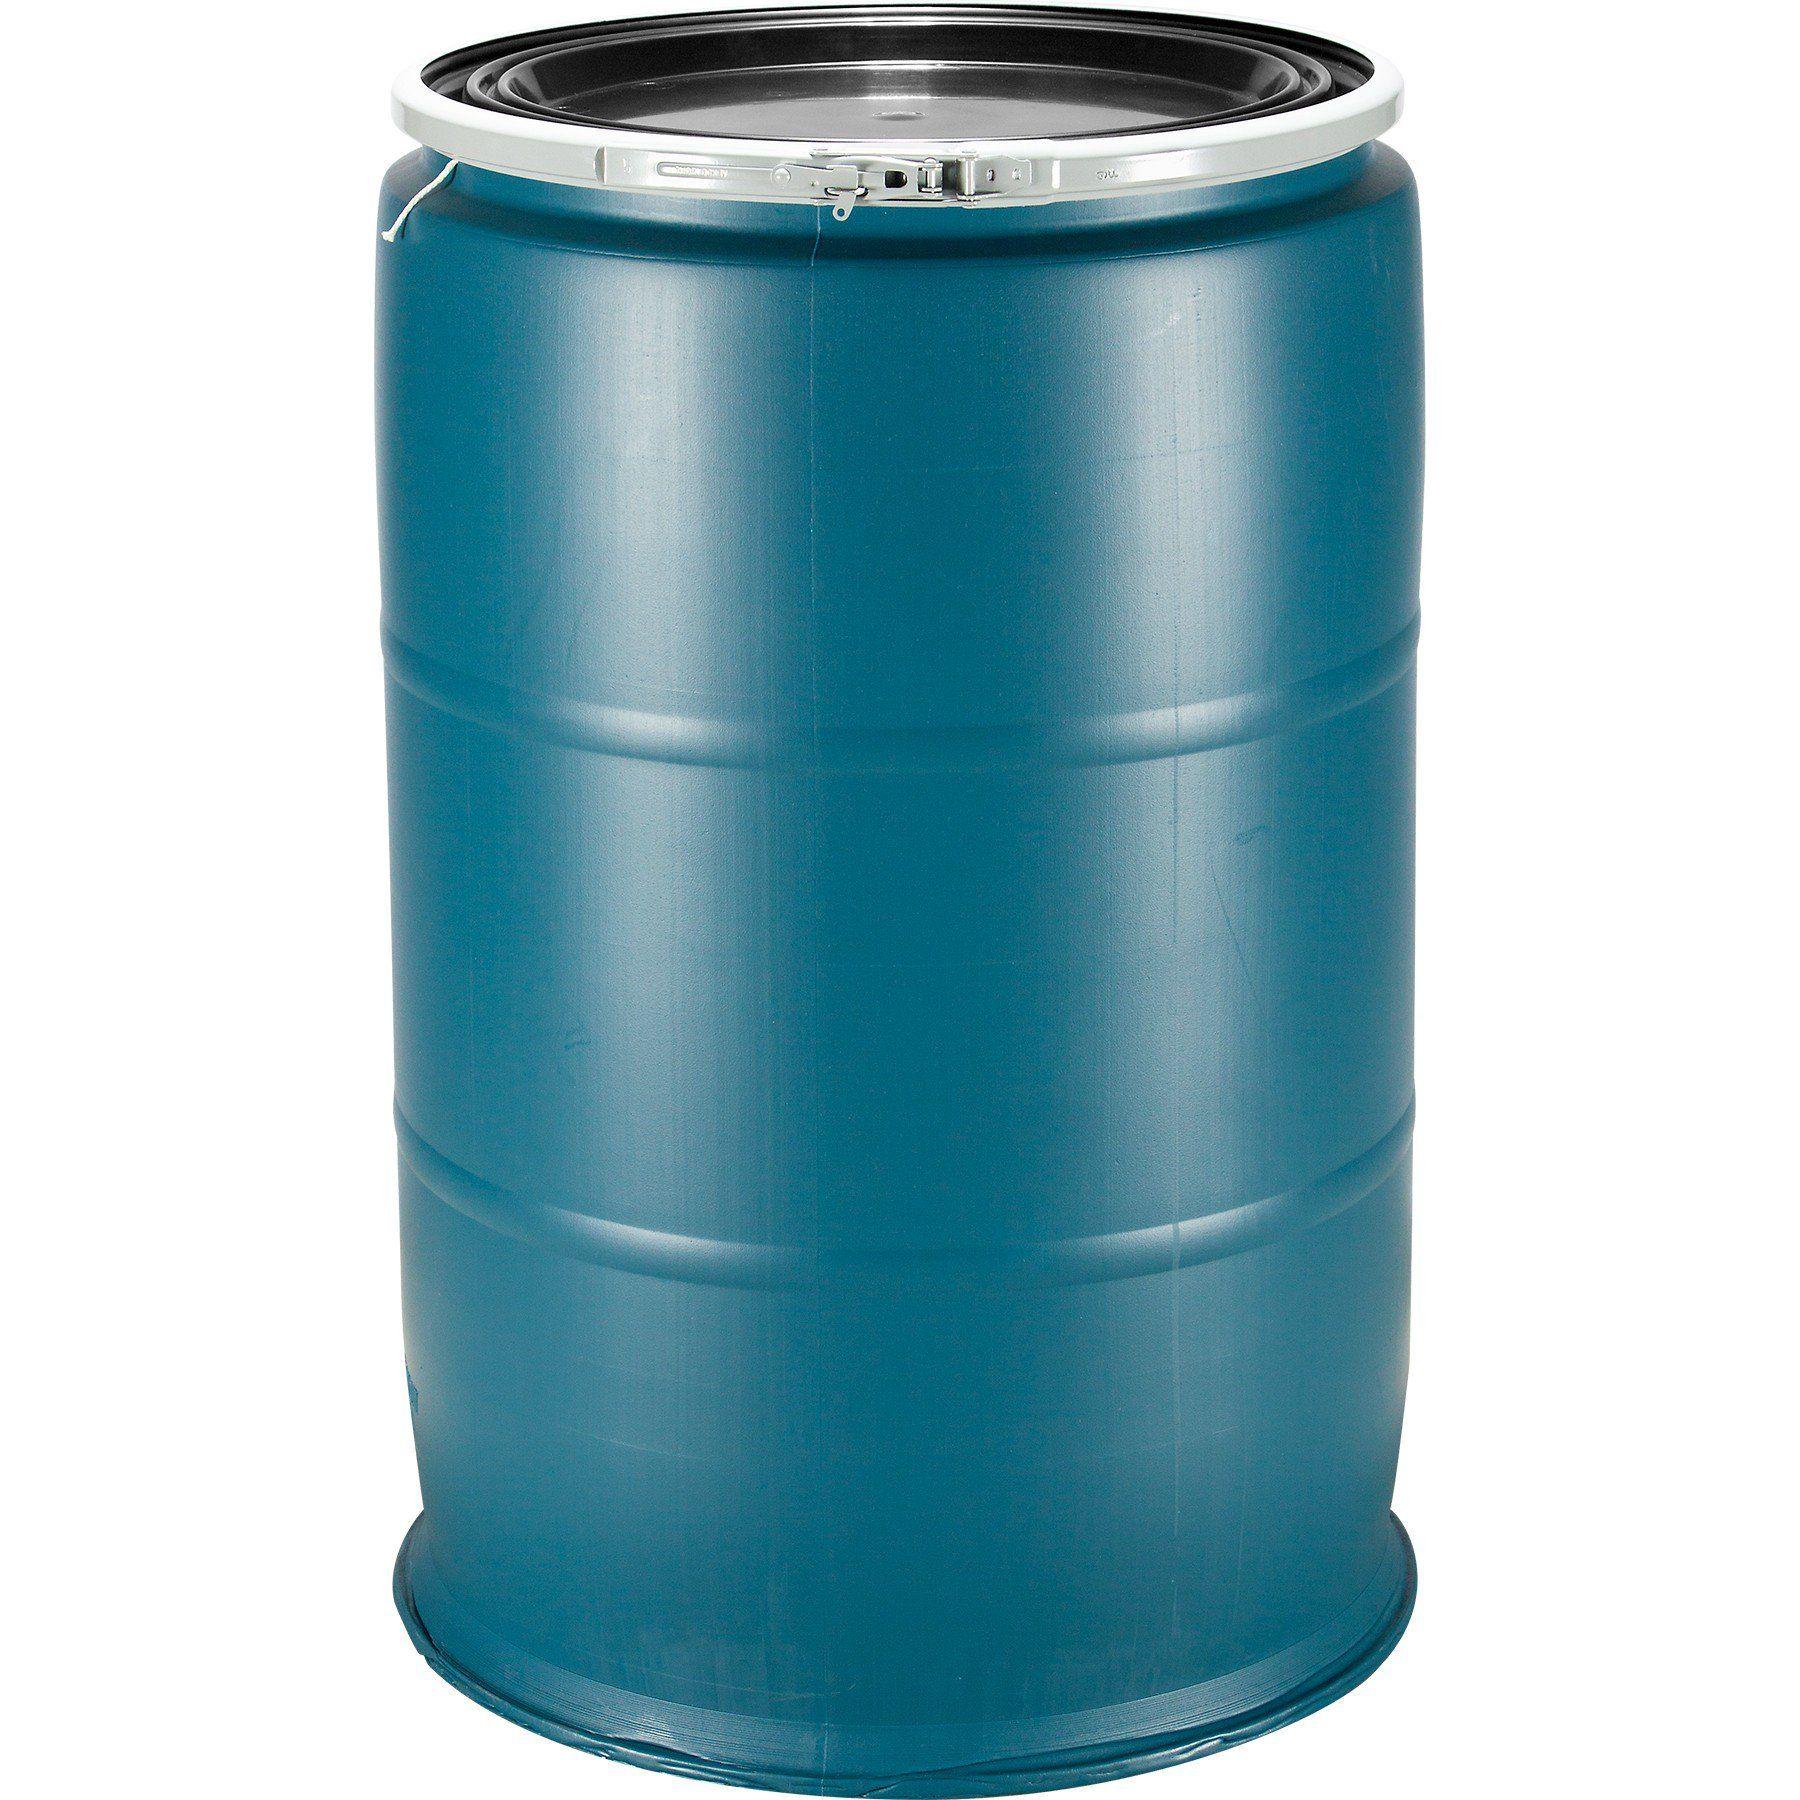 55 Gallon Plastic Drum, Reconditioned, Various Colors